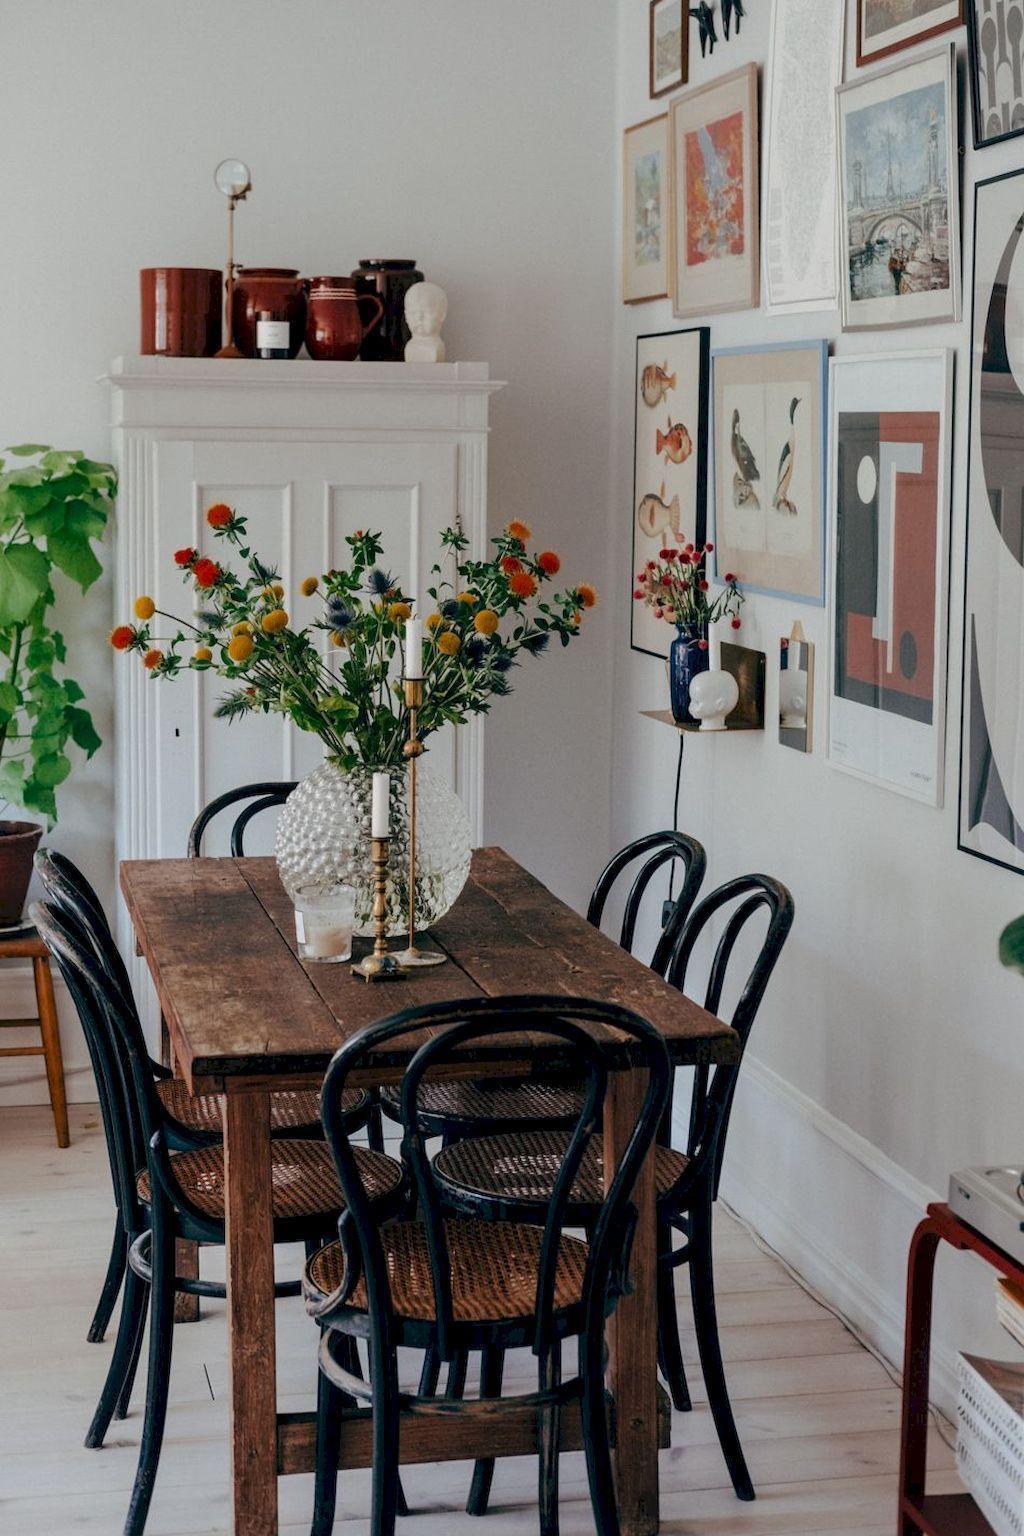 35 Inspiring Farmhouse Dining Room Table Design Ideas